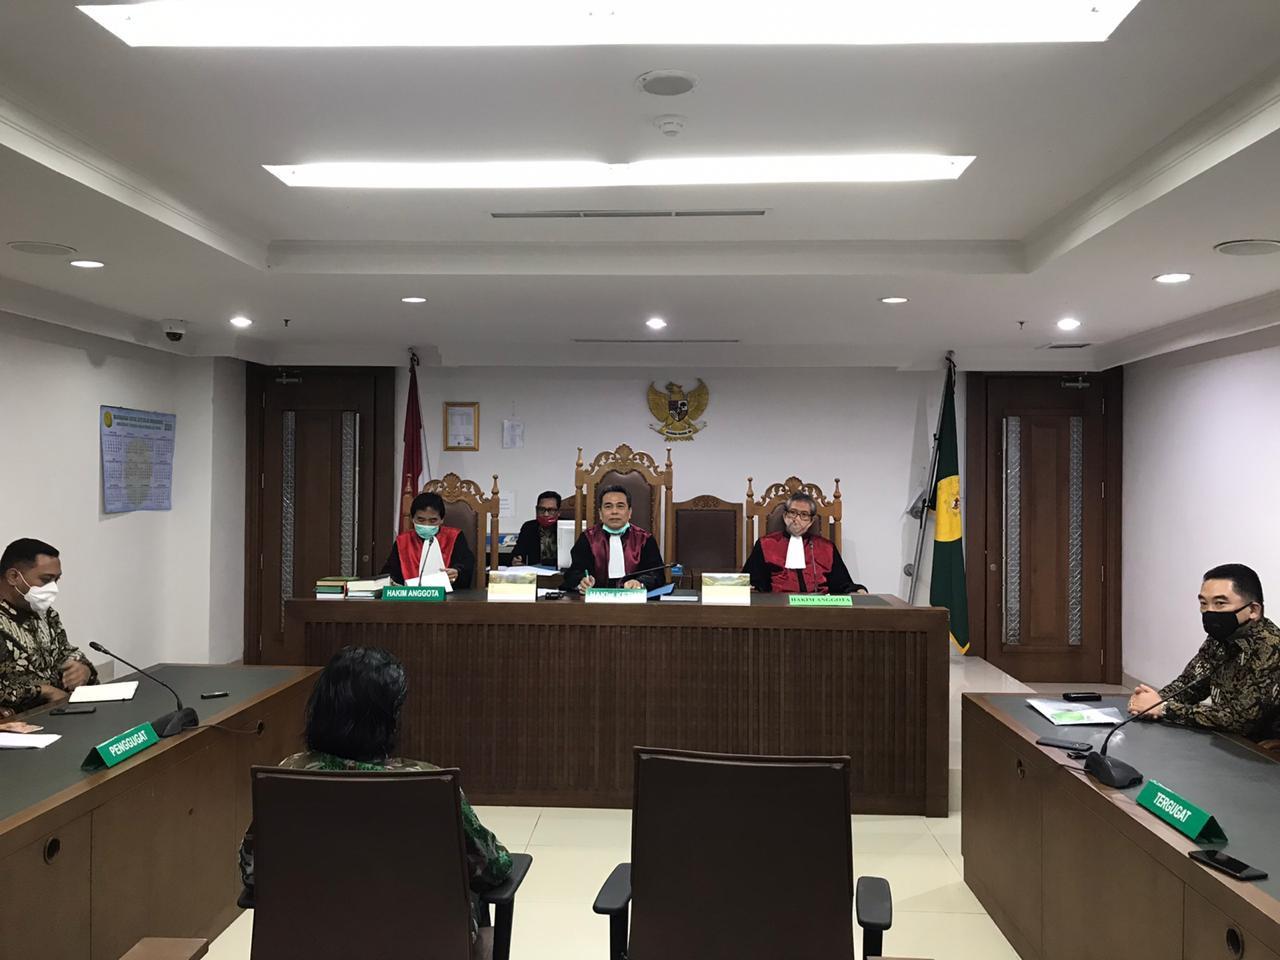 PKPU KCN Berakhir Damai, Hakim Minta Semua Pihak Menaati Kesepakatan - JPNN.com